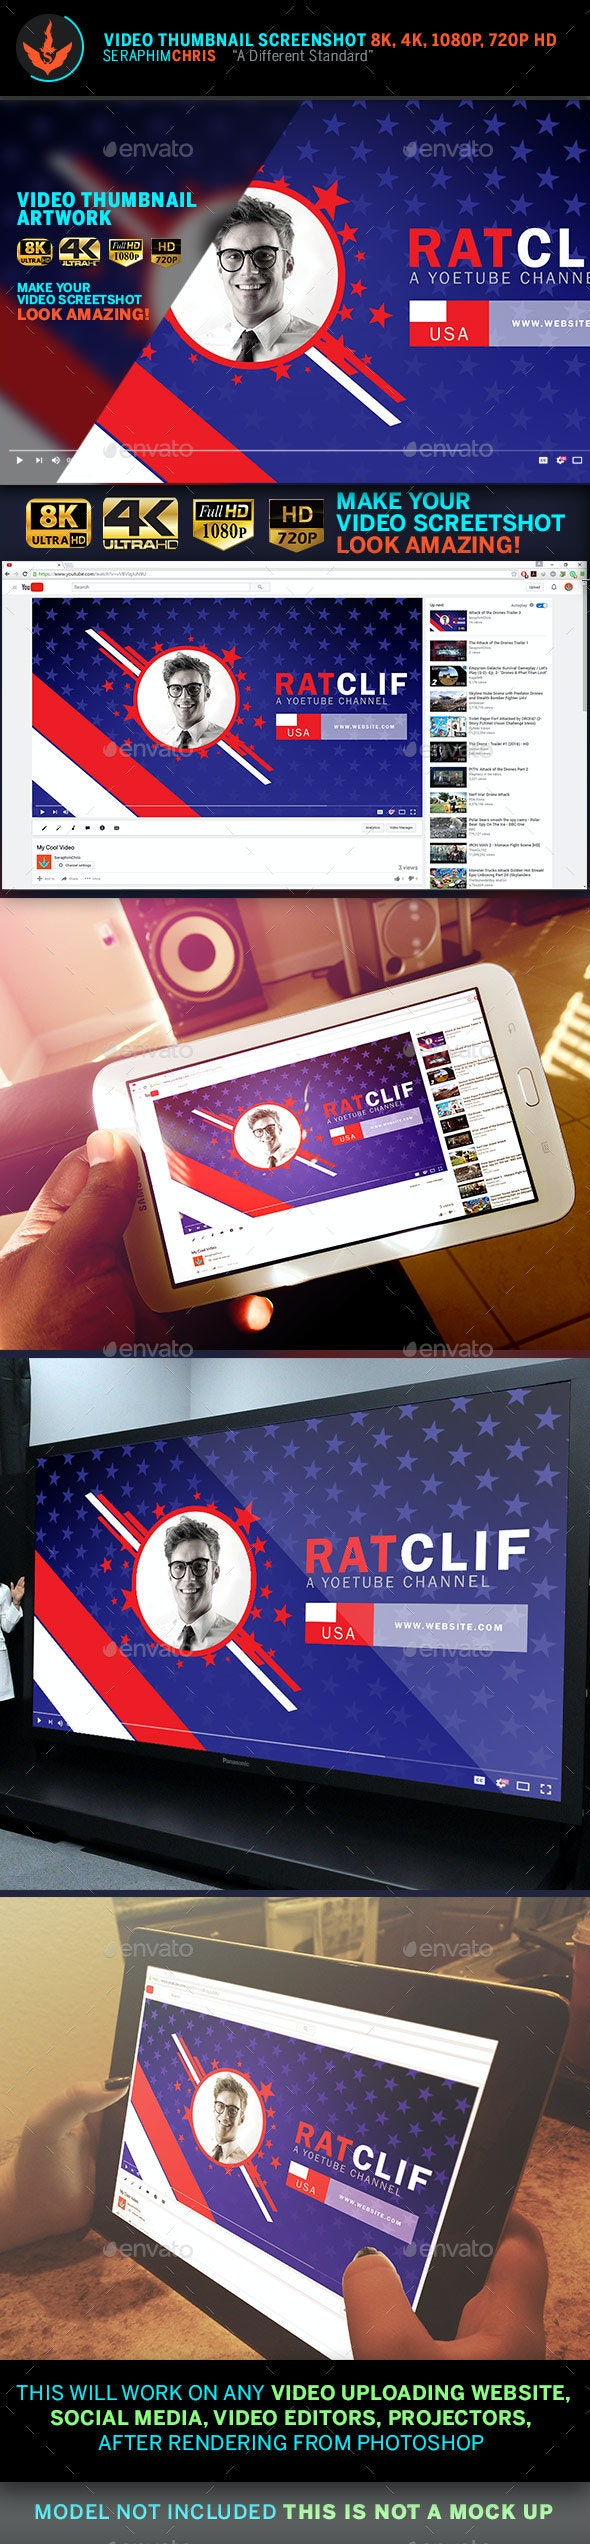 Political YouTube Video Thumbnail Screenshot Template 9 - YouTube Social Media